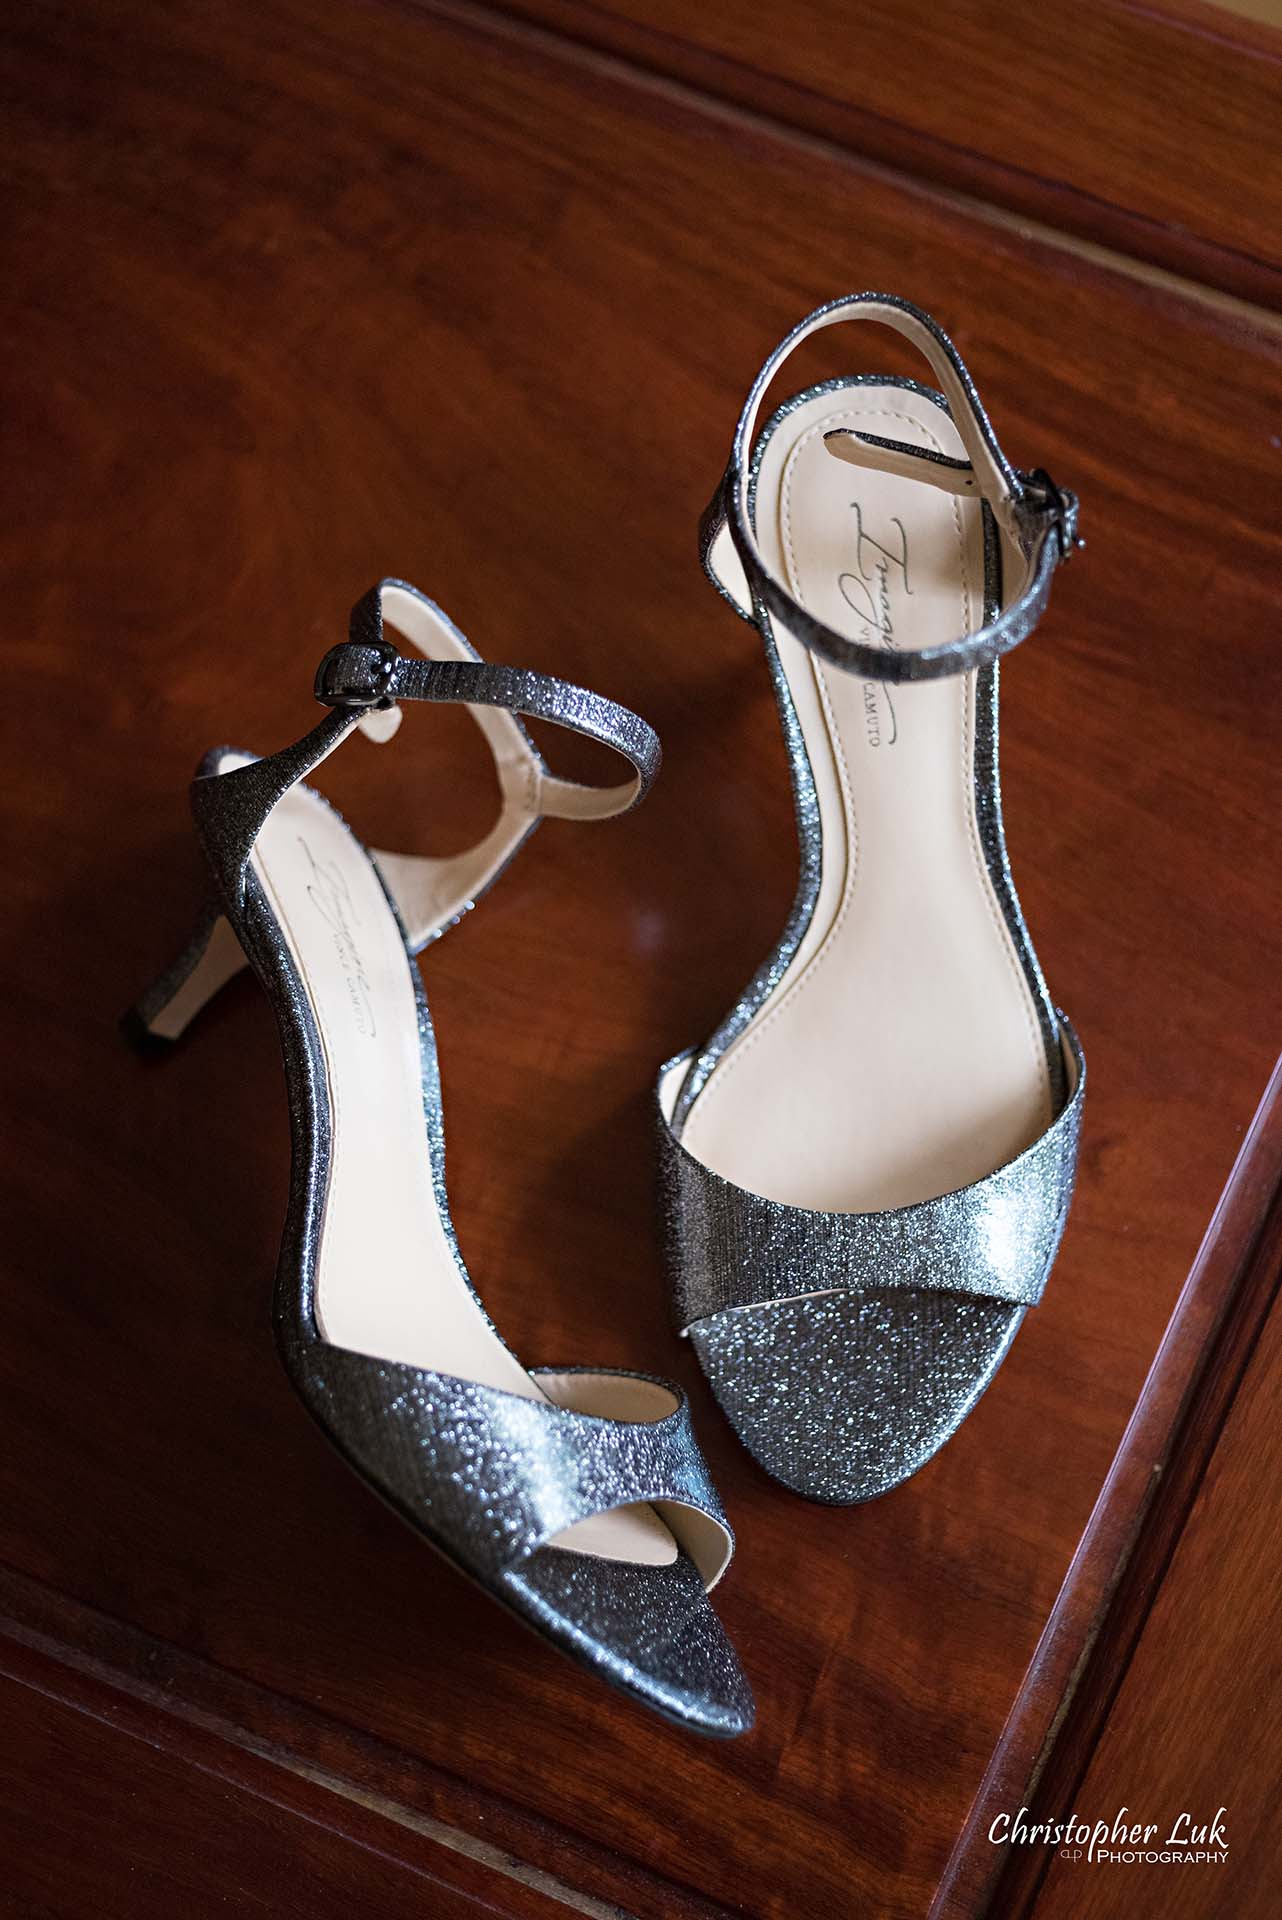 Christopher Luk Toronto Wedding Photographer Bride Getting Ready Preparations Bridal Silver Shoes Pumps Straps Sandals High Heels